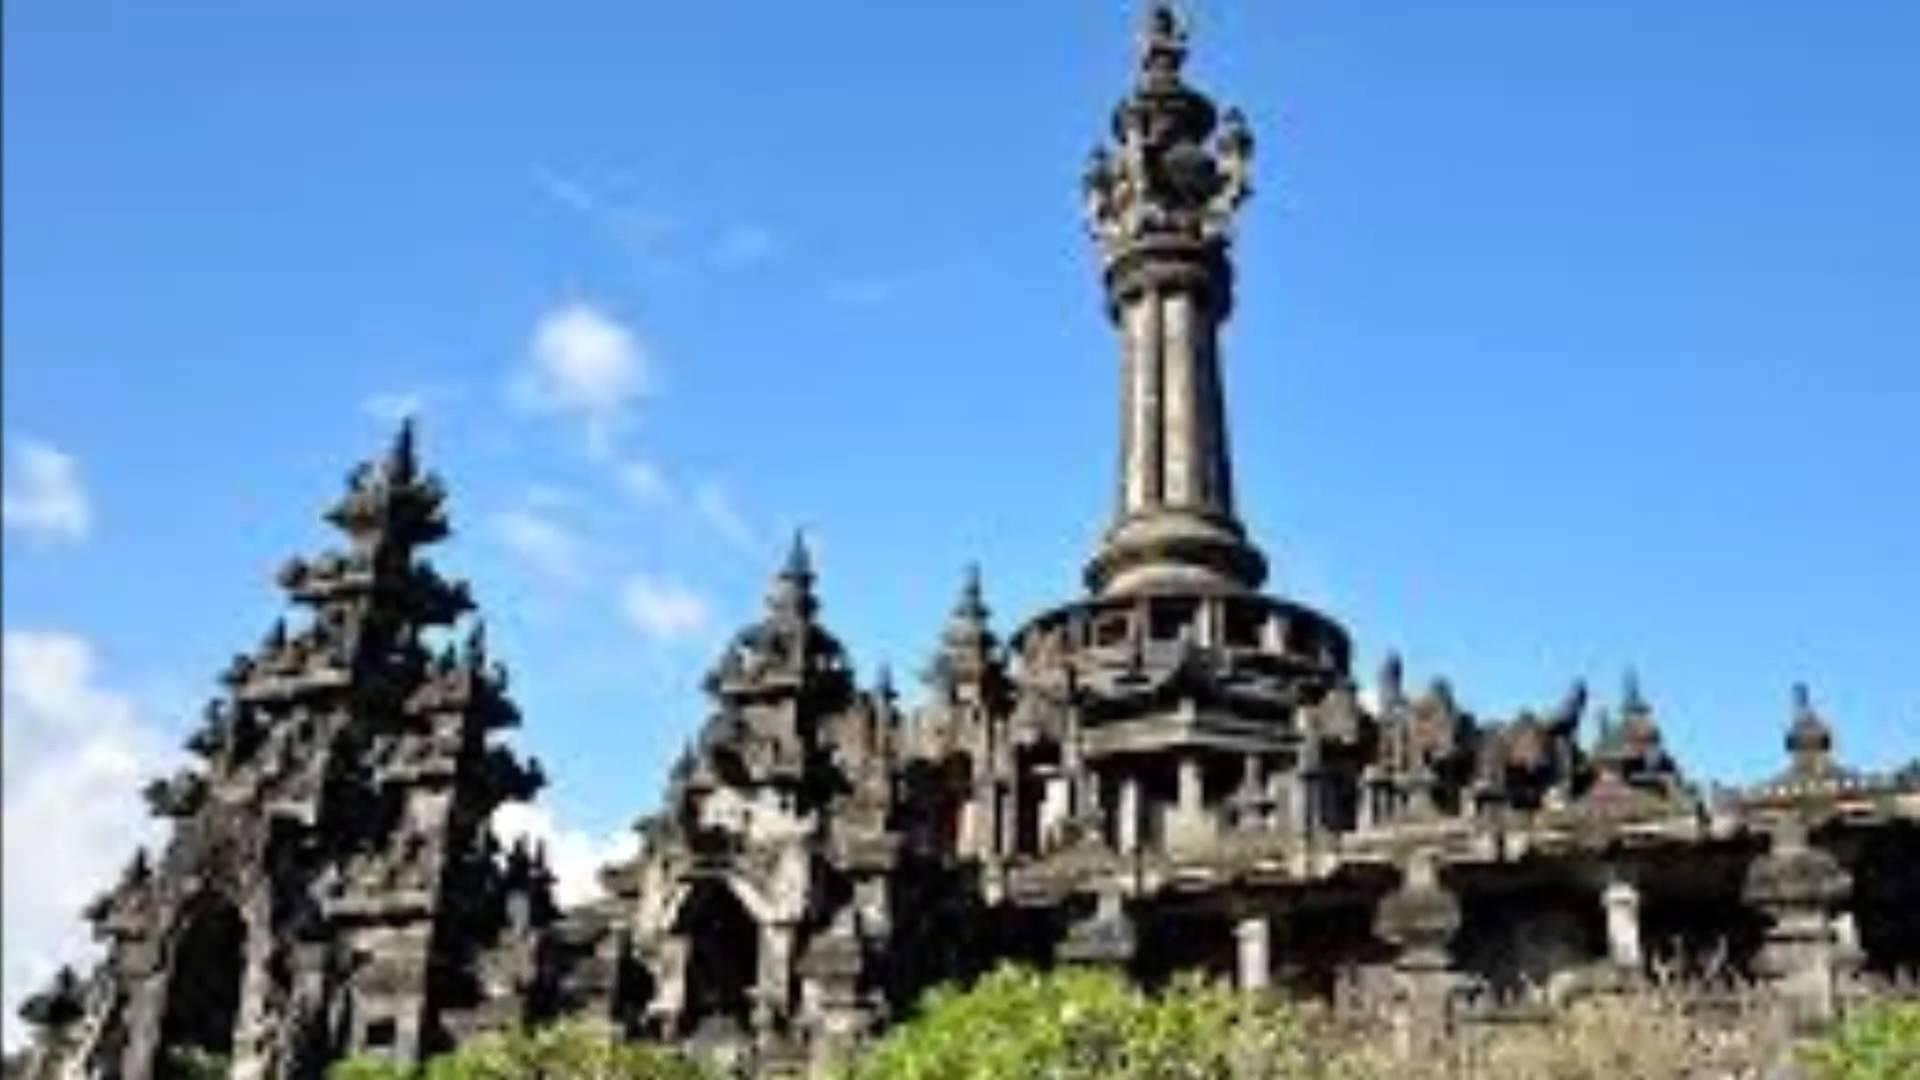 Entrance Ticket Bajra Sandhi Monument Denpasar Bali Youtube Renon Kota